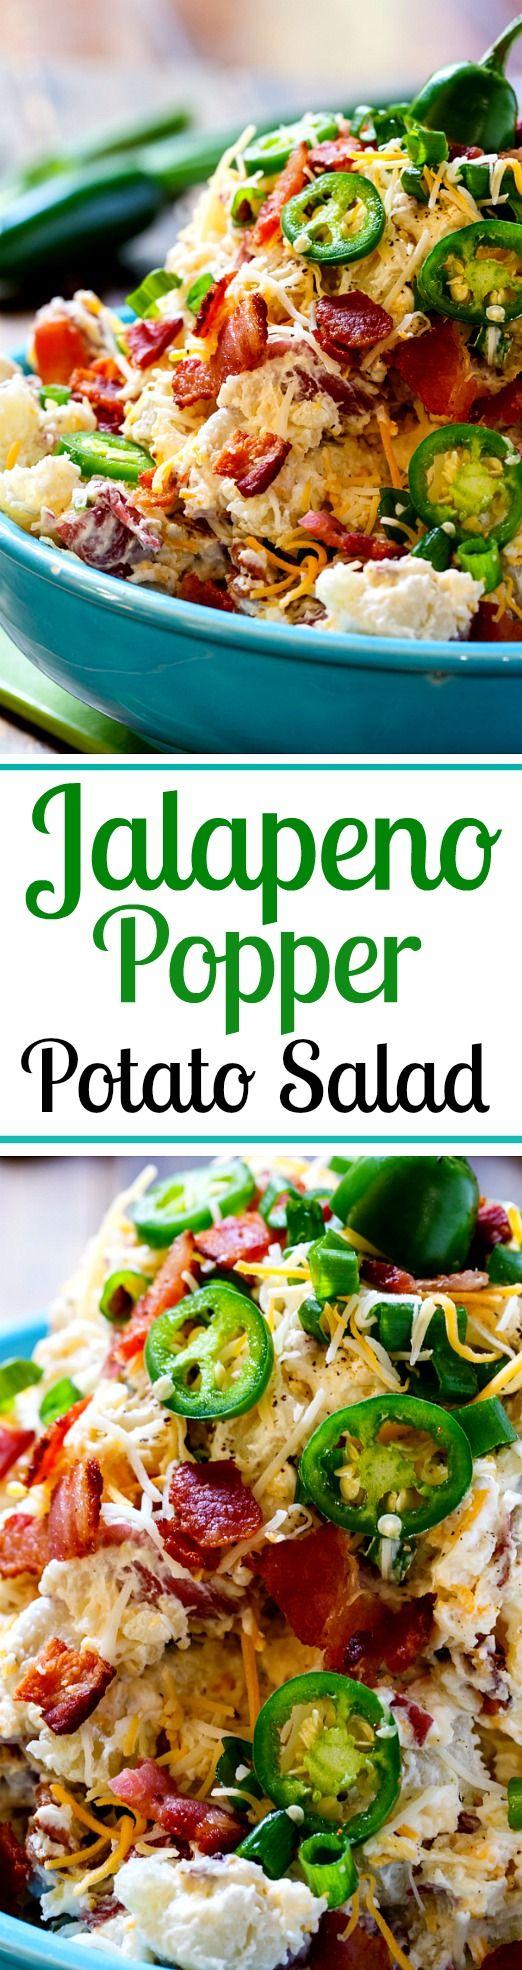 Jalapeno Popper Potato Salad | Recipe | Potato Salad, Jalapeno Poppers ...